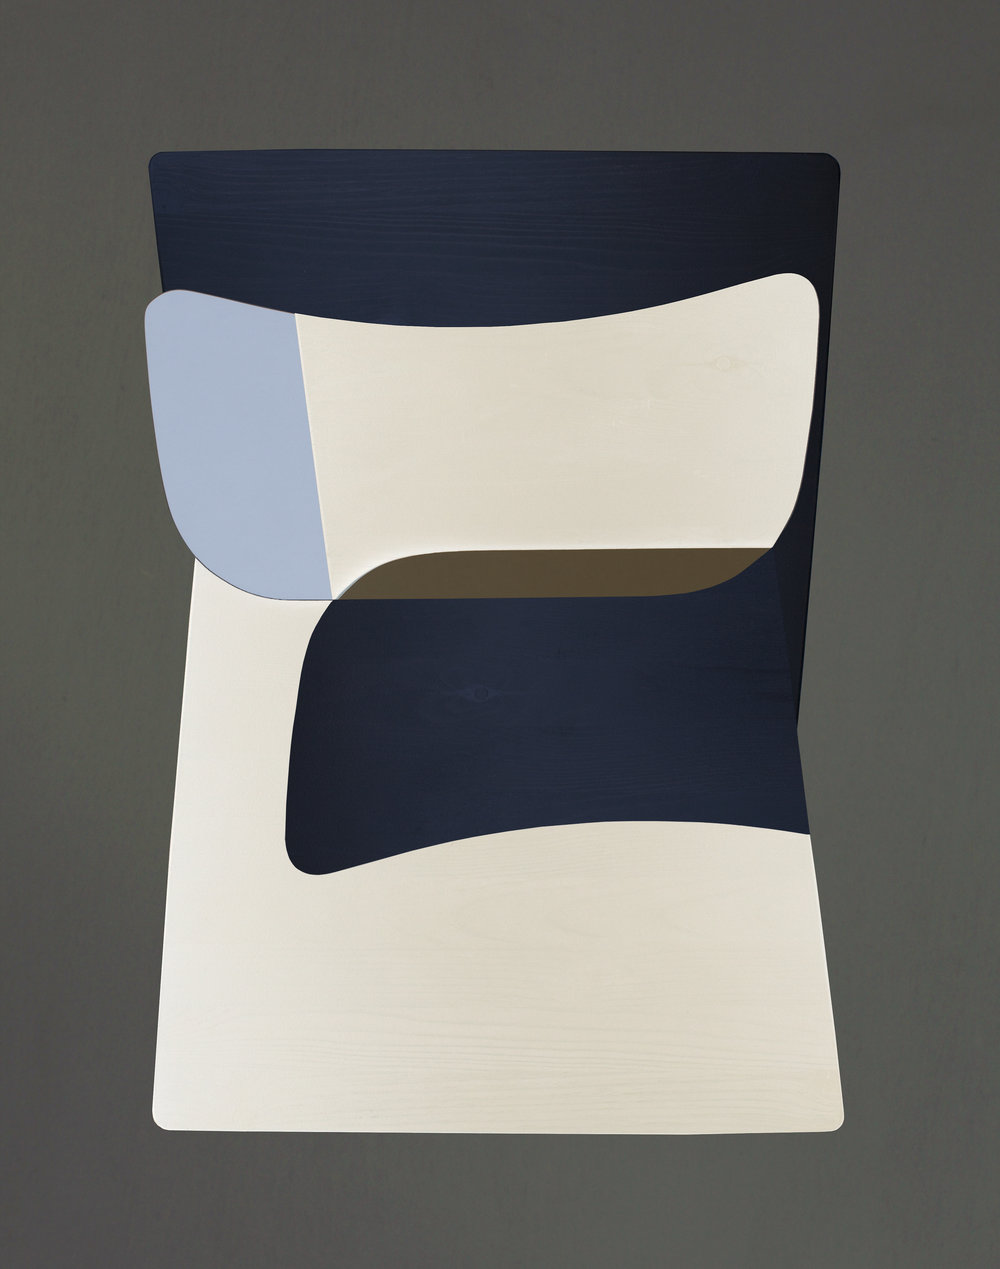 Denis Darzacq,  Contreformes No. 3 , 2017  Digital pigment print, 100 X 78.79 cm (39.37 × 31 in), edition of 5   Inquire